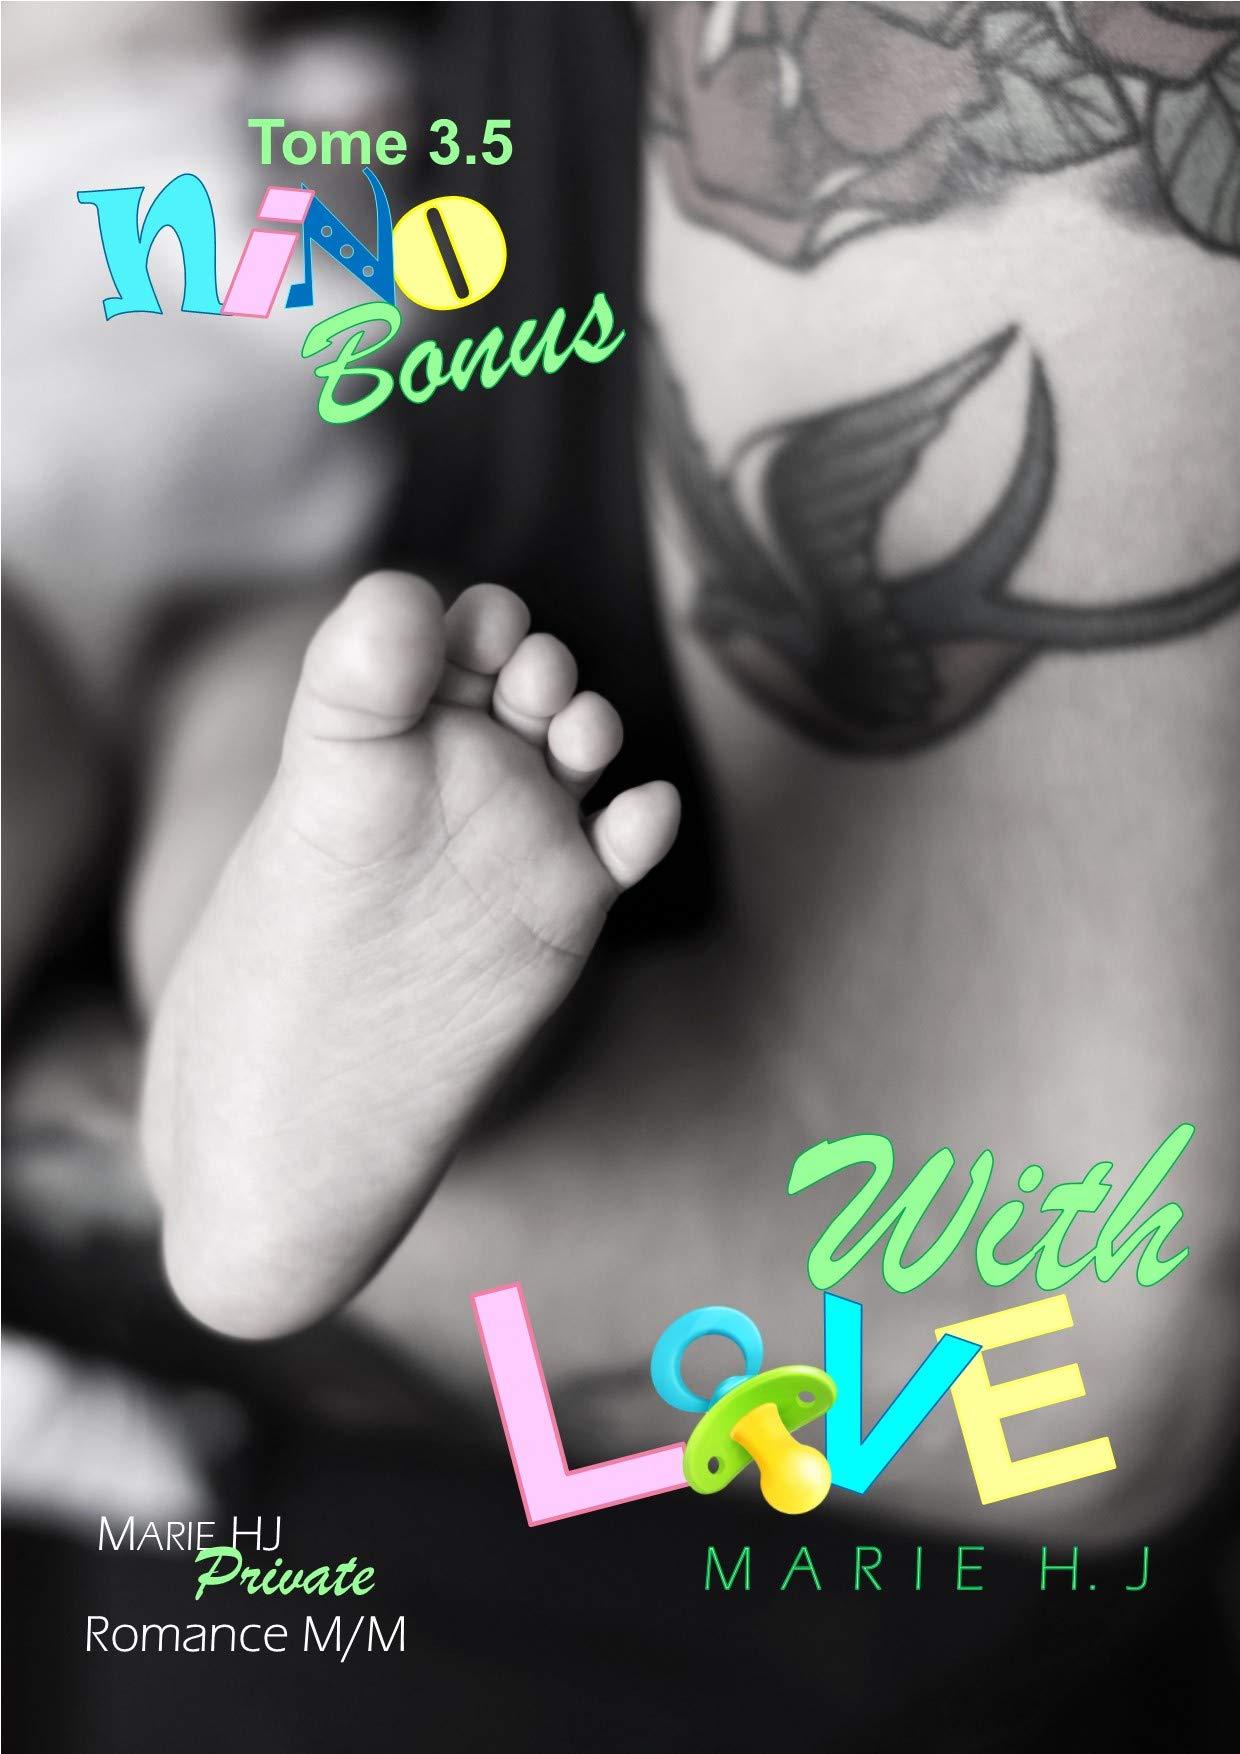 With Love #3.5 Bonus Nino por Marie H.J